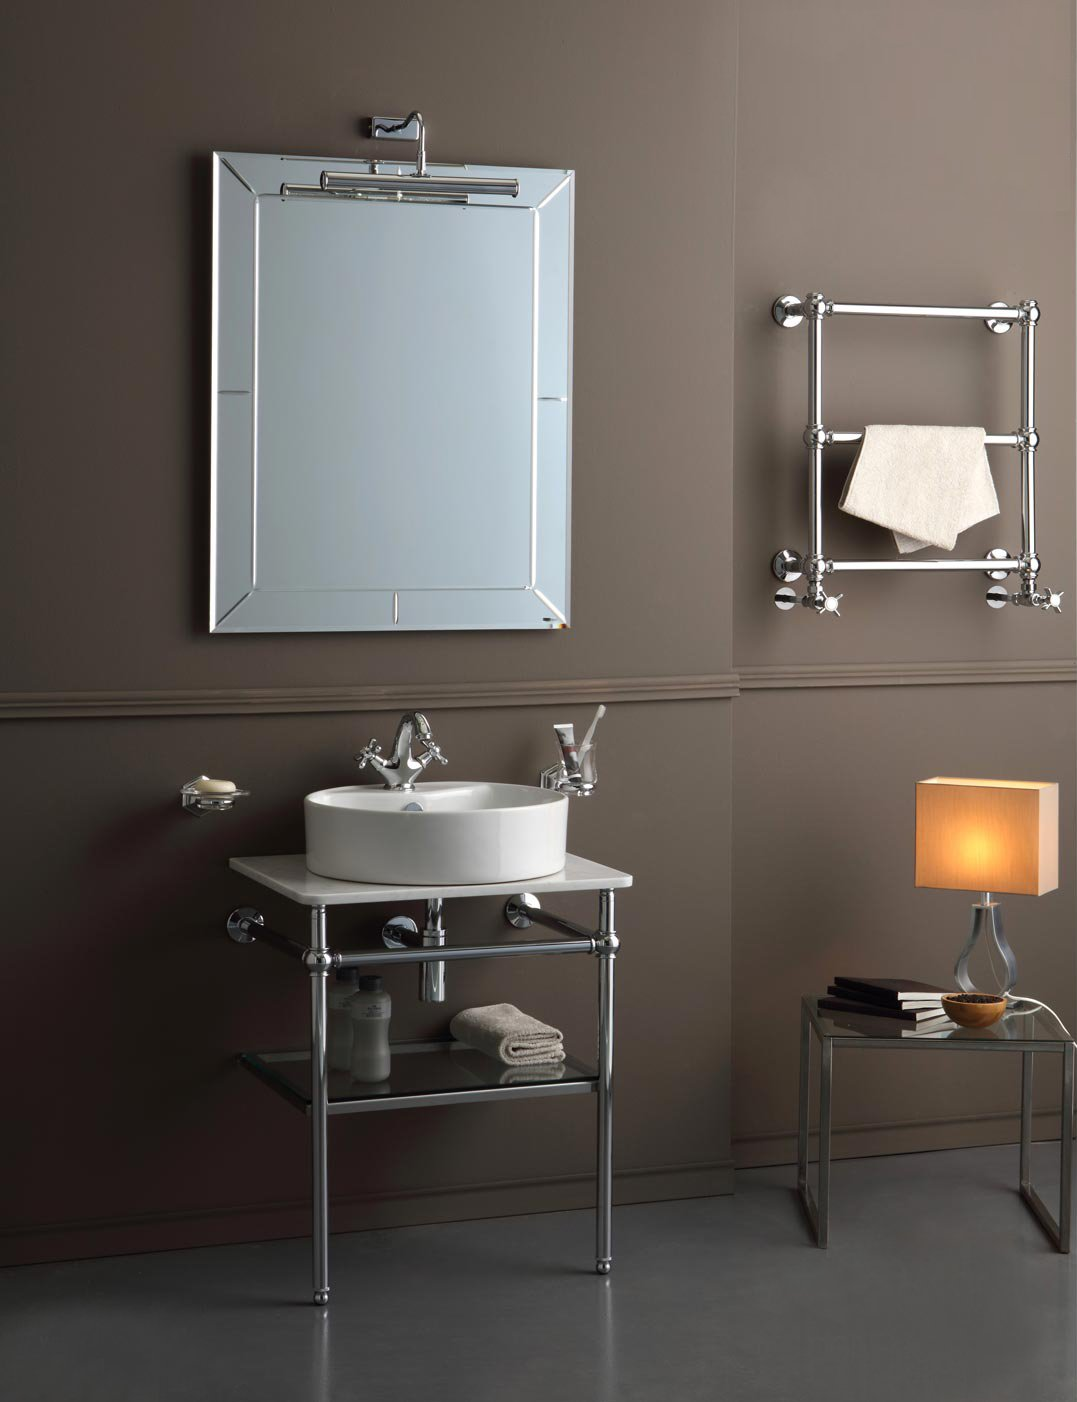 Specchio d arredo specchio d arredo with specchio d - Specchio d arredo ...